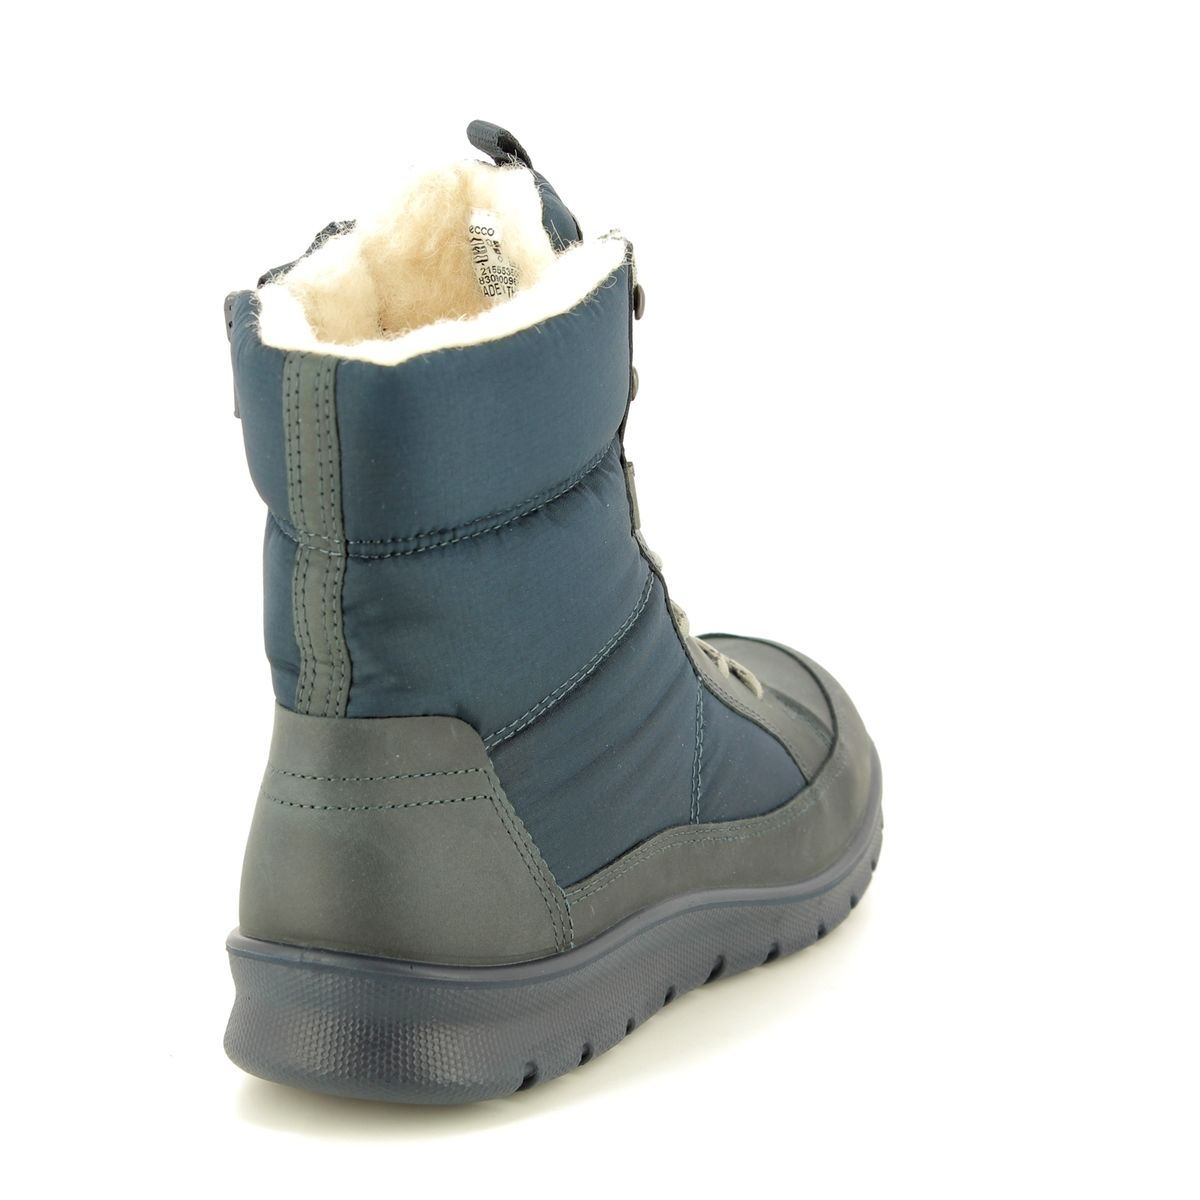 7283c3e4720 ECCO Winter Boots - Navy nubuck - 215553/50642 BABETT BOOT GORE-TEX 85